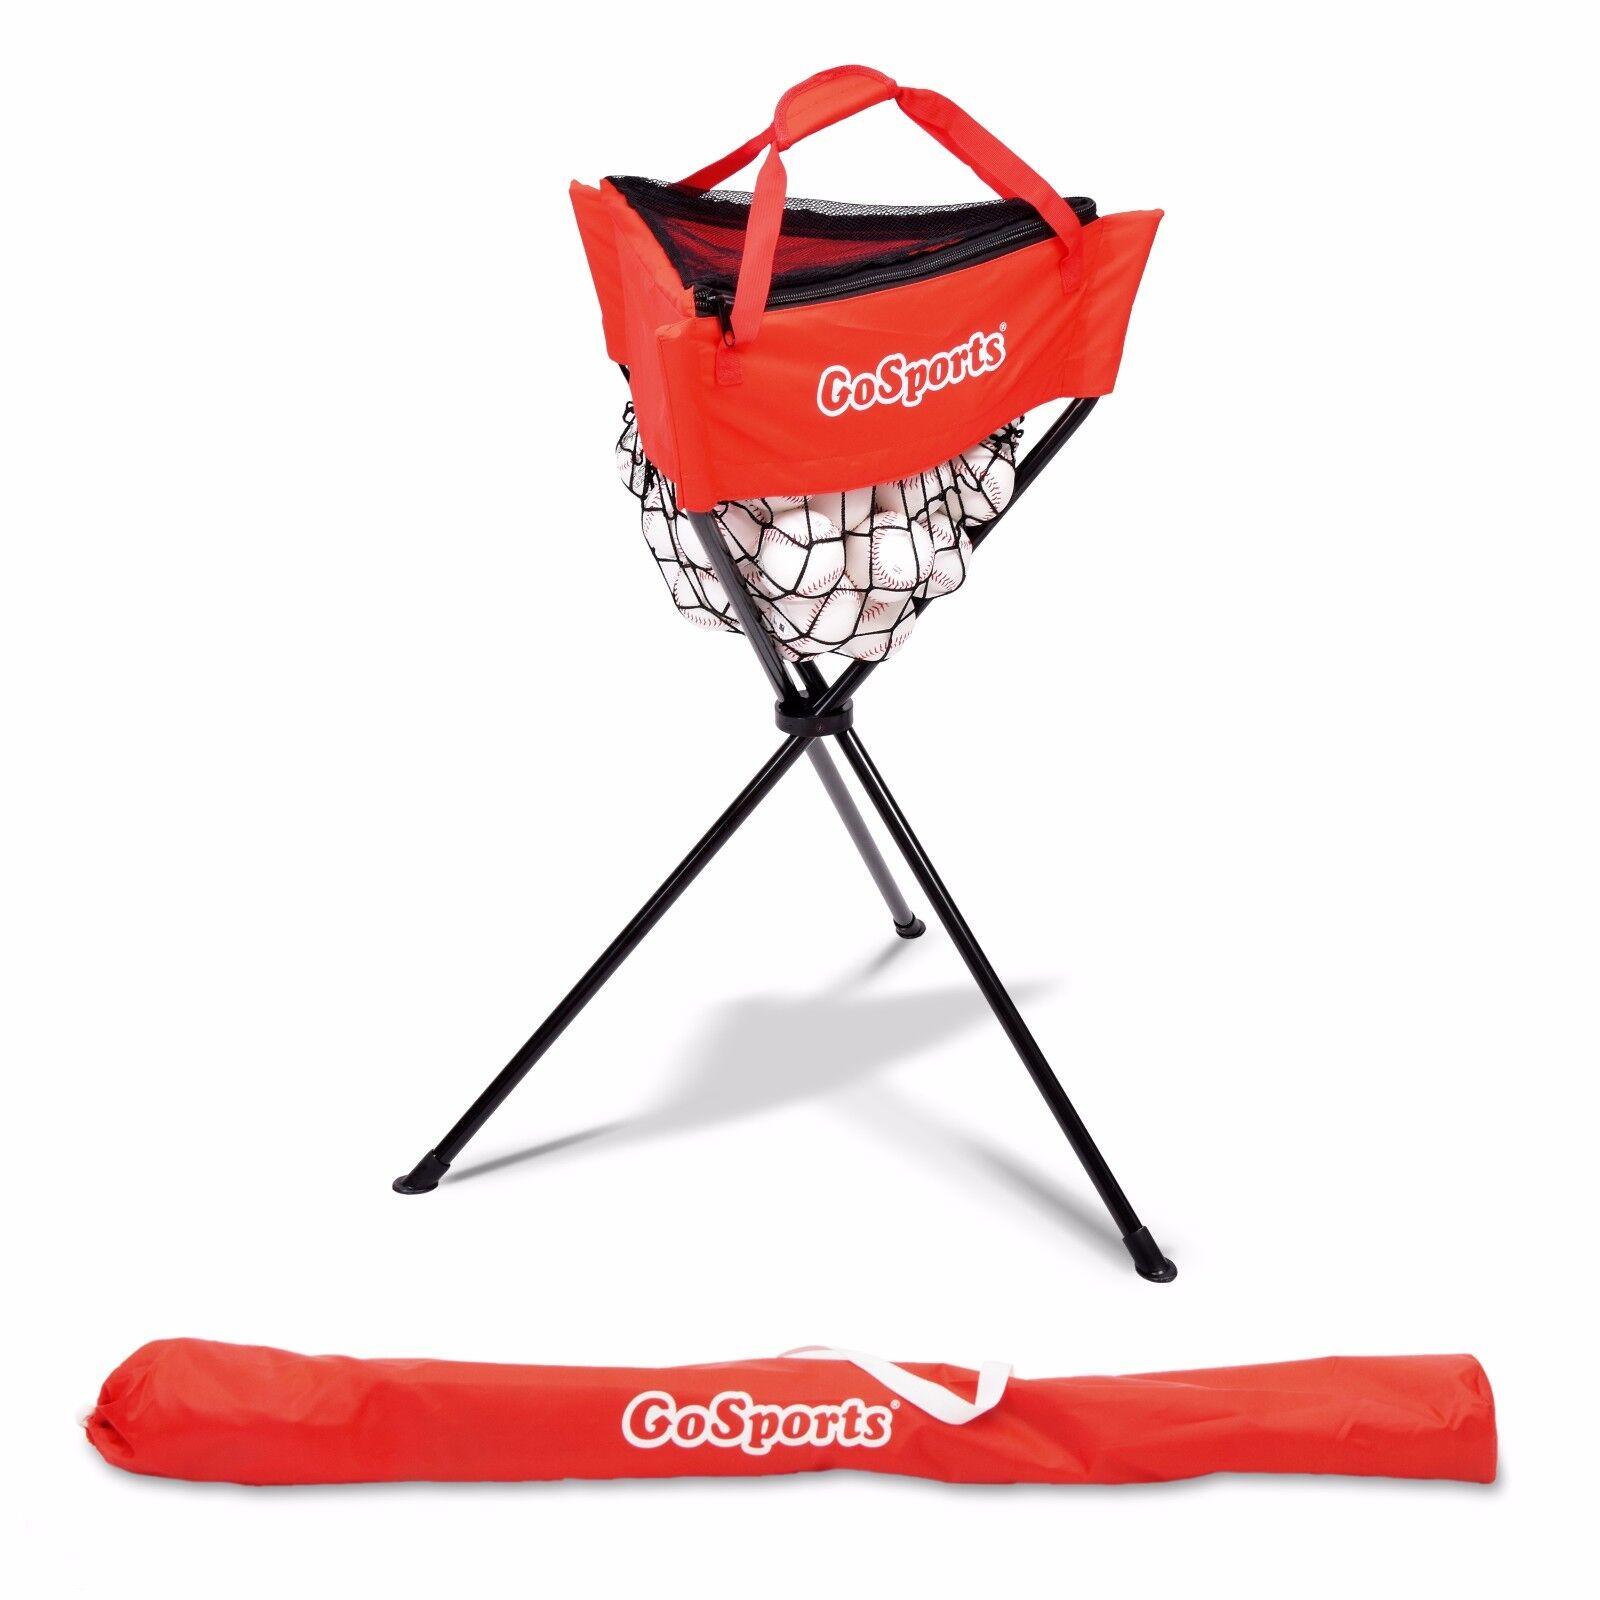 GoSports Portable Baseball & Softball Fielding Practice Ball Caddy w Carry Bag